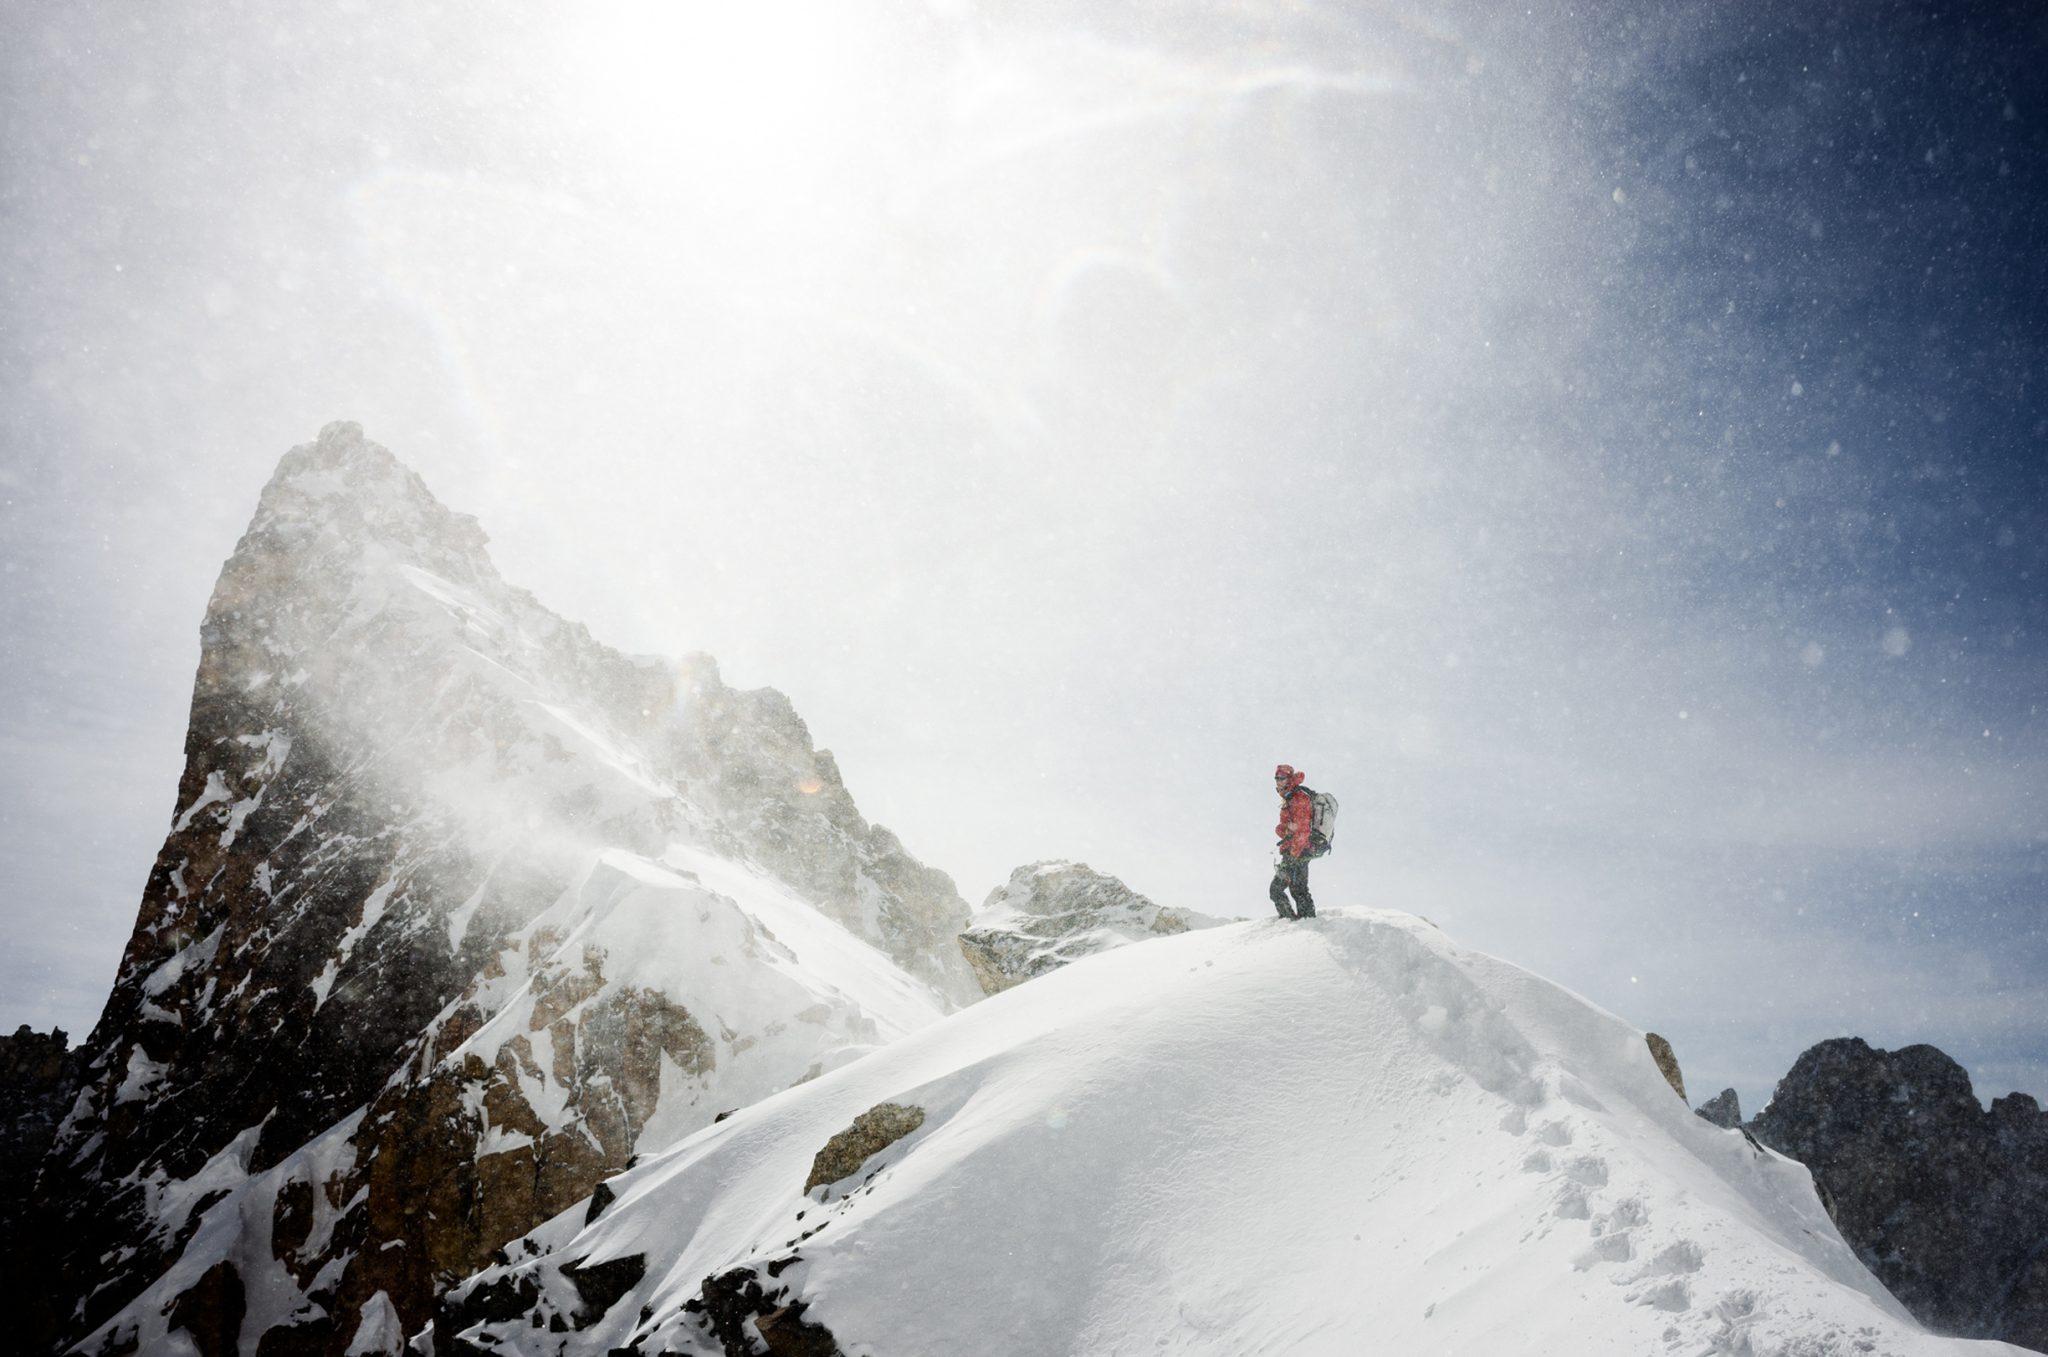 Ski Mountaineering Jeff in the Tetons